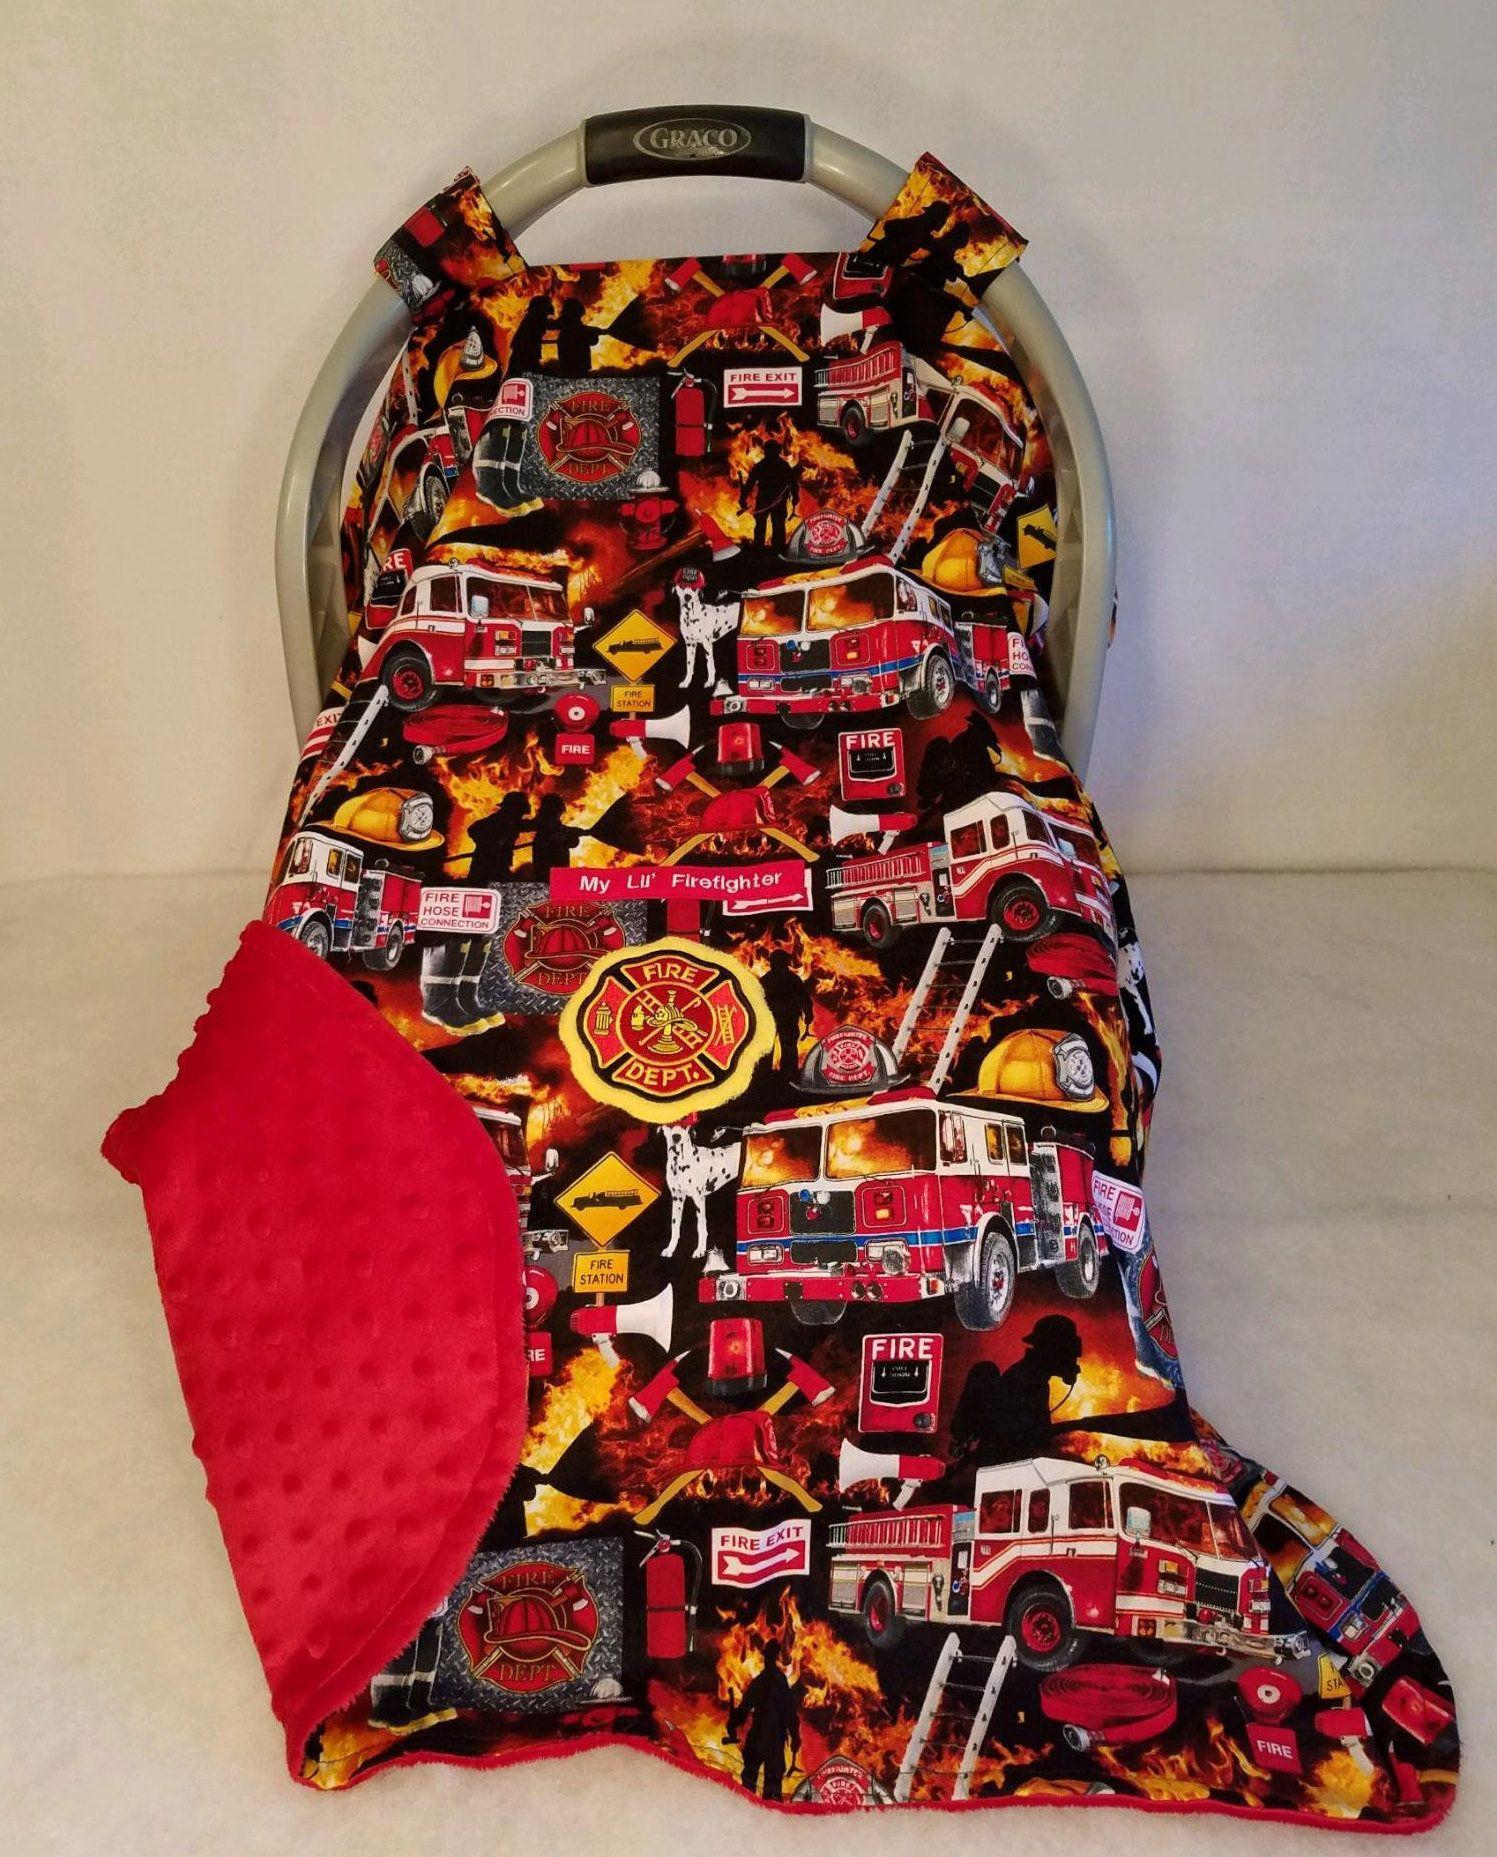 Car Seat Canopy Muddy Orange Cotton Camo Baby /& Blaze Orange Minky Dot Lining Cozy Hand Made Infant Custom Embroider My Little Dear Antlers